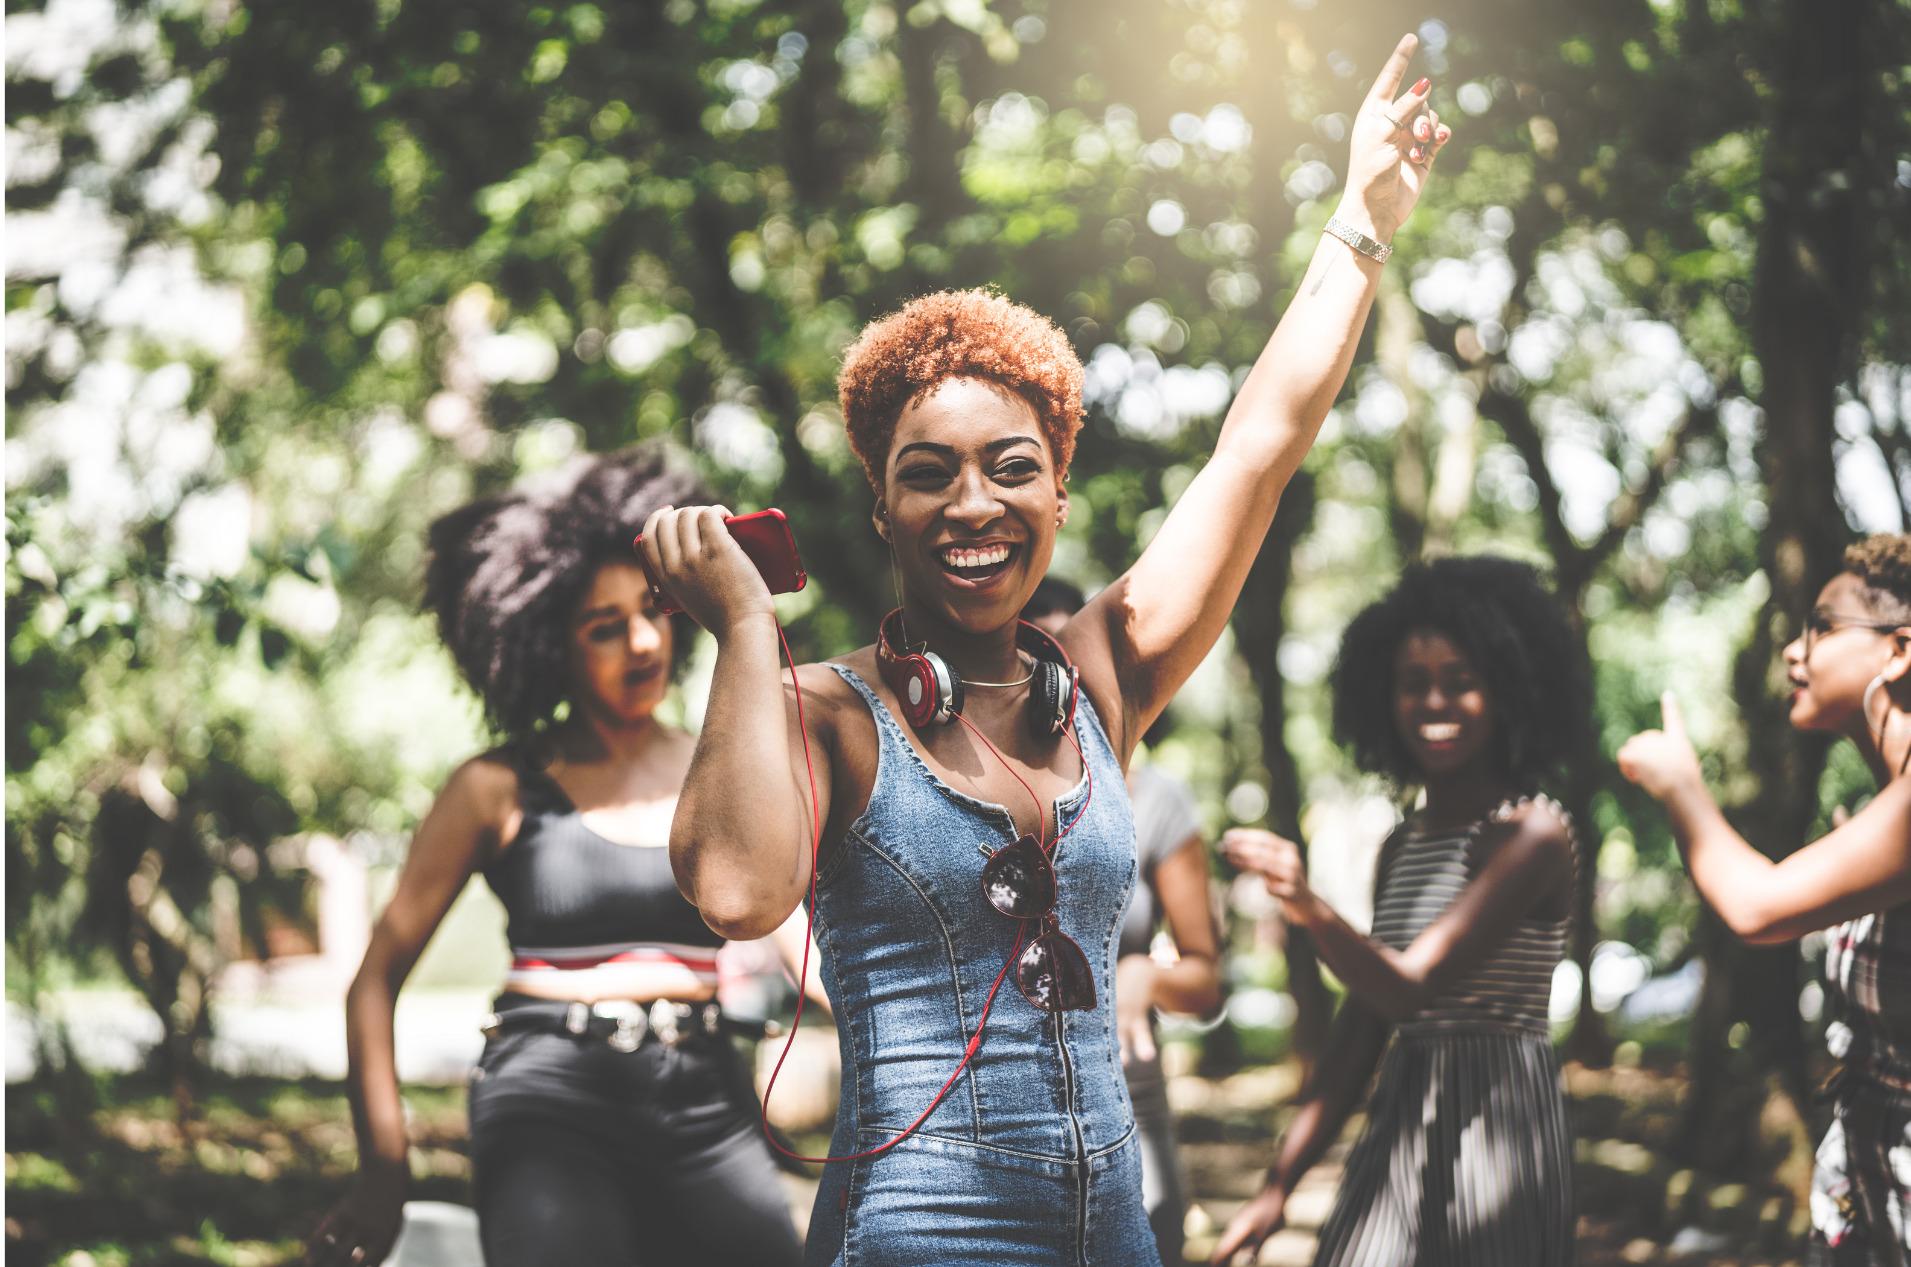 A group of girlfriends dance to popular TikTok songs